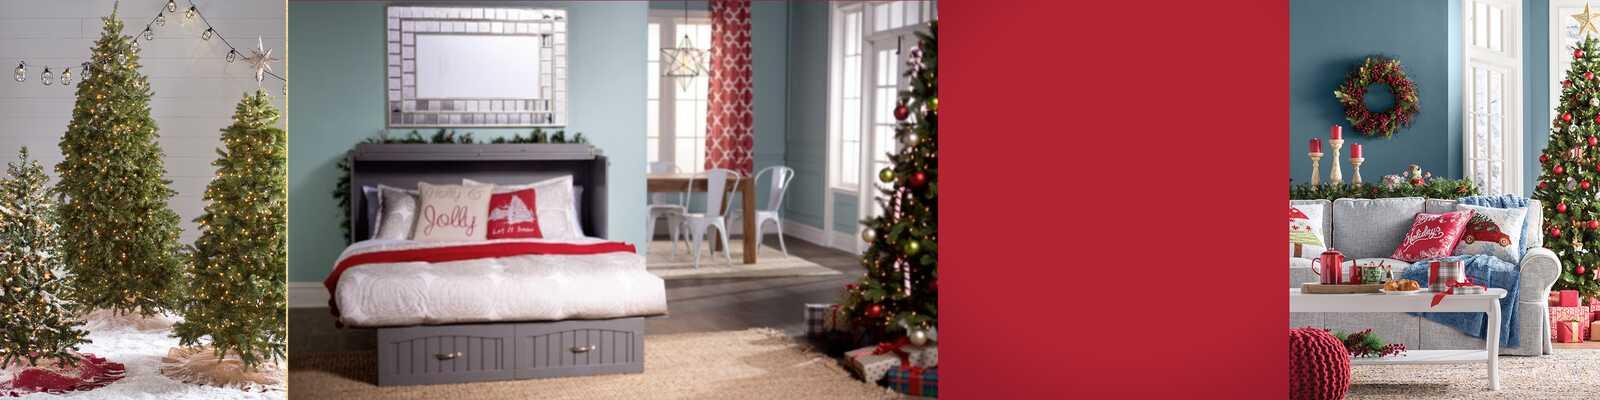 Background_image Big Holiday Sale